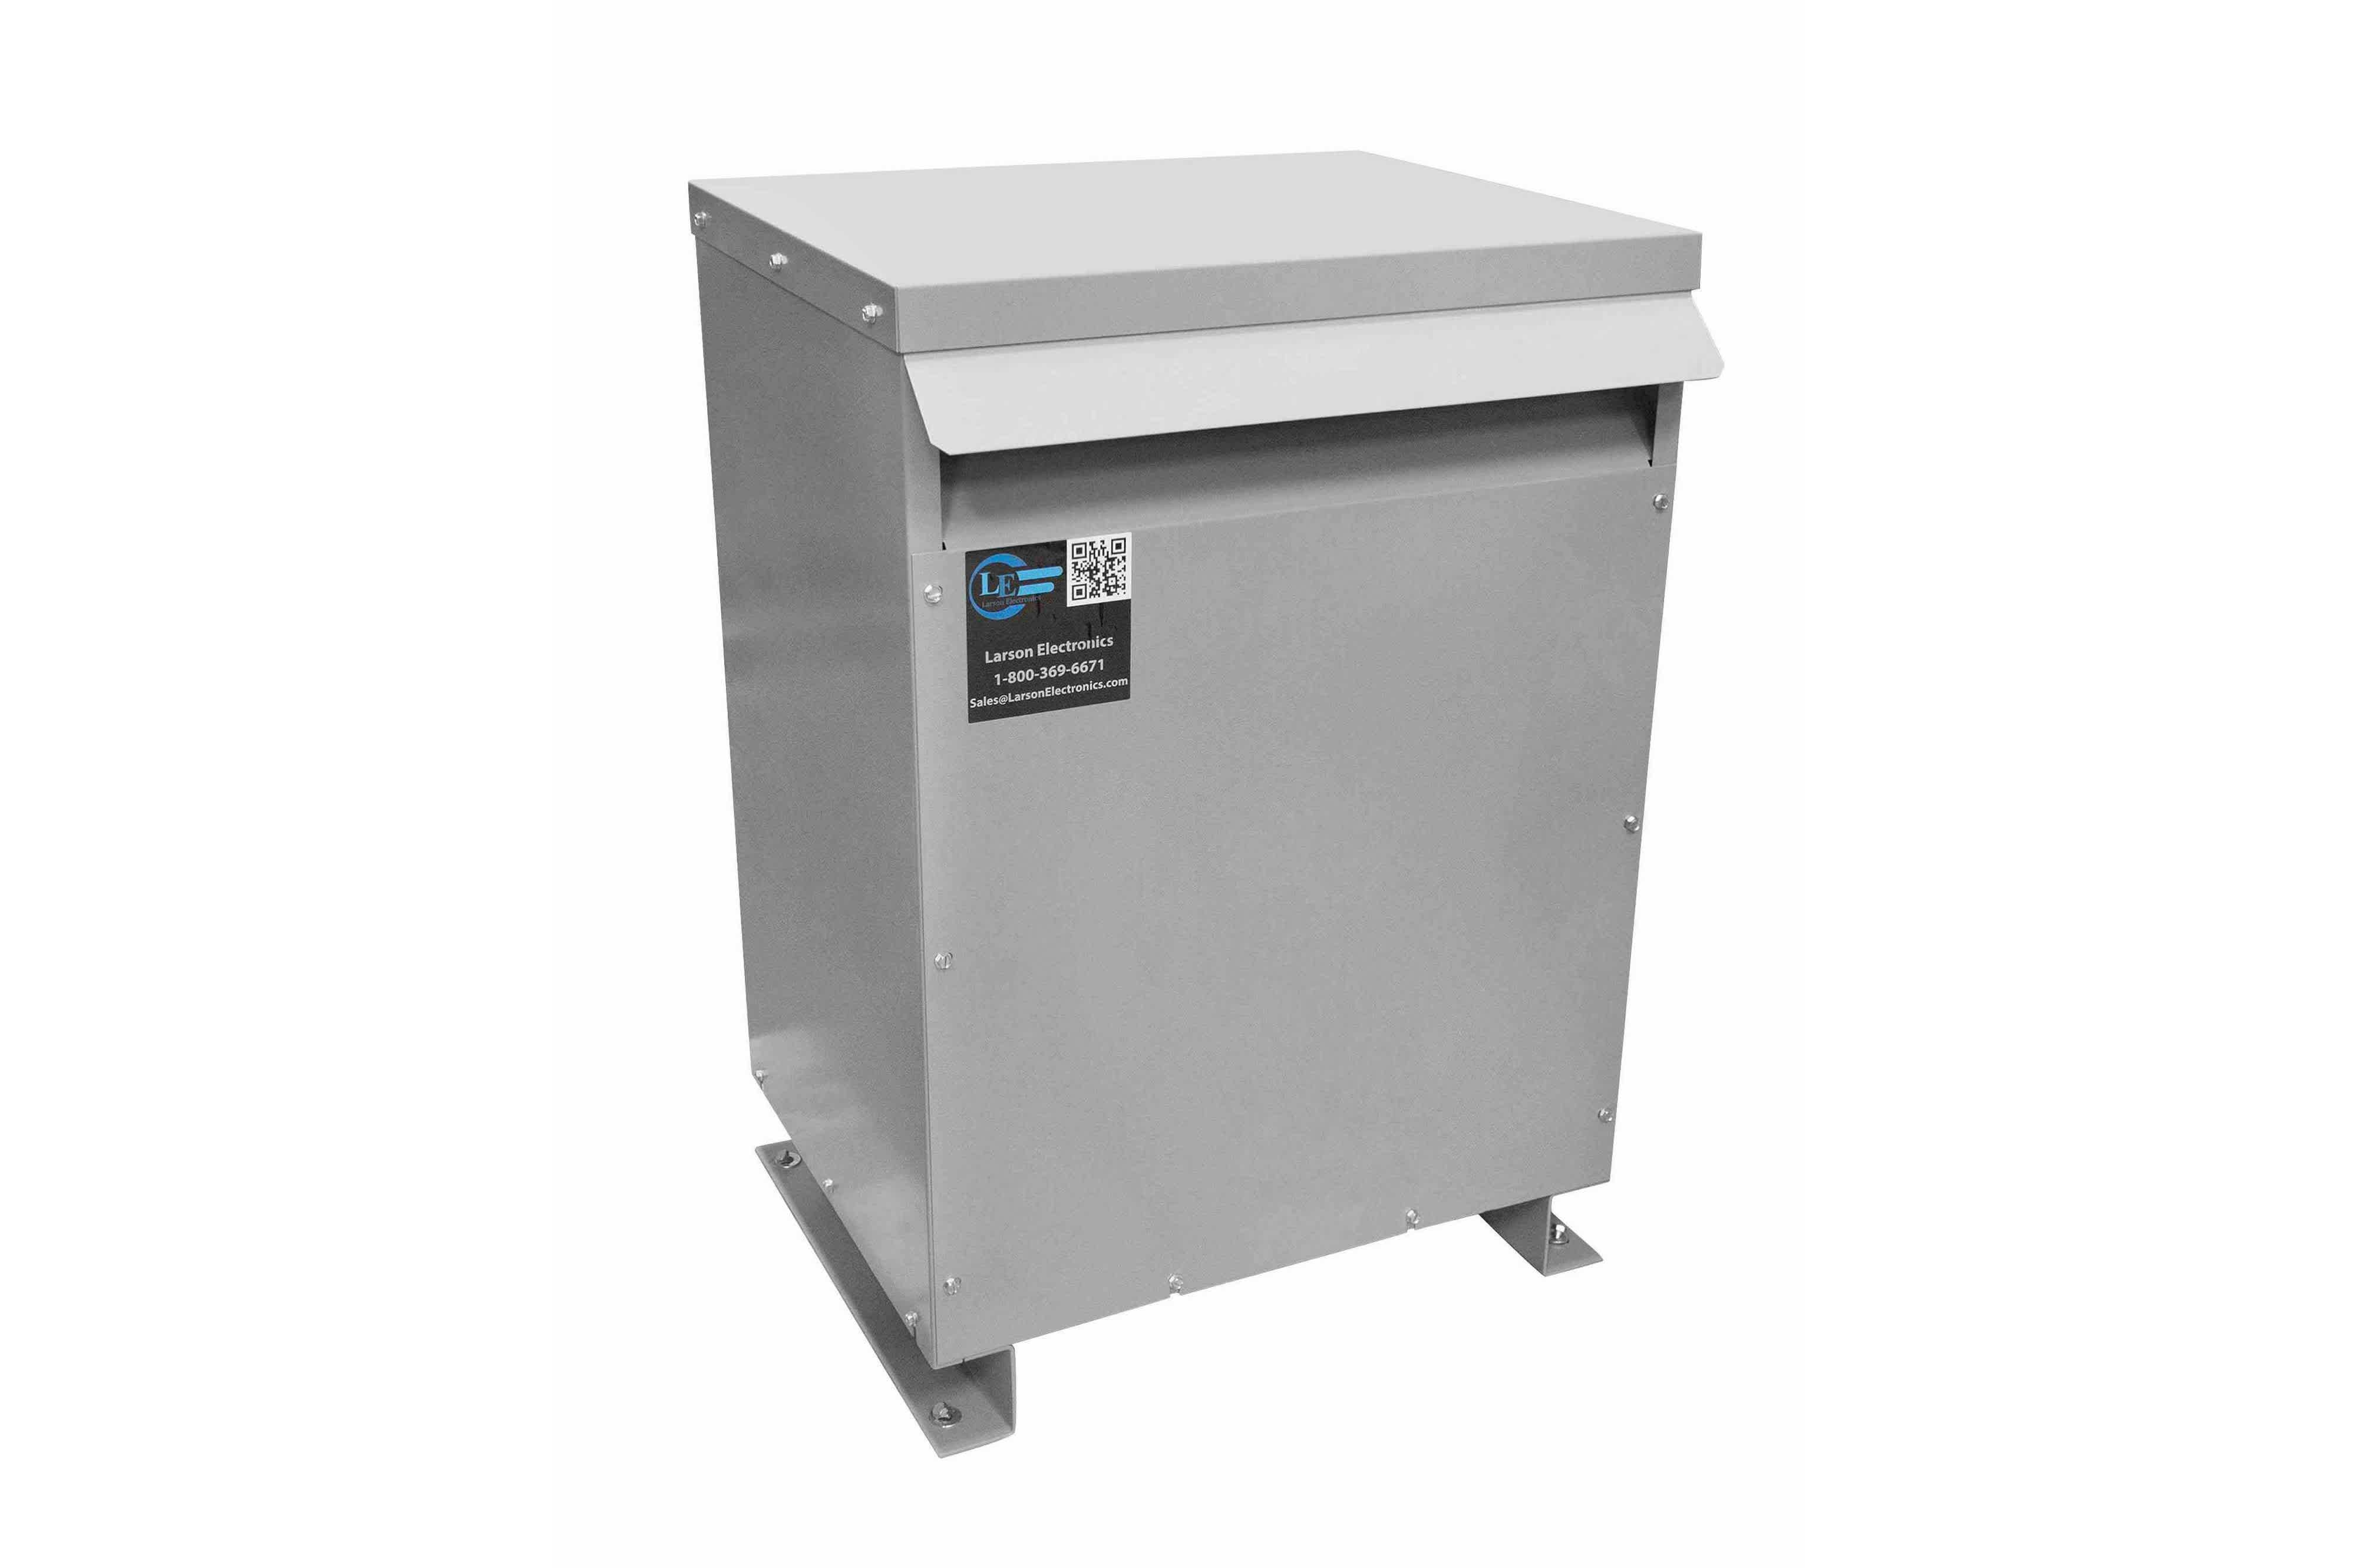 60 kVA 3PH Isolation Transformer, 380V Wye Primary, 600V Delta Secondary, N3R, Ventilated, 60 Hz